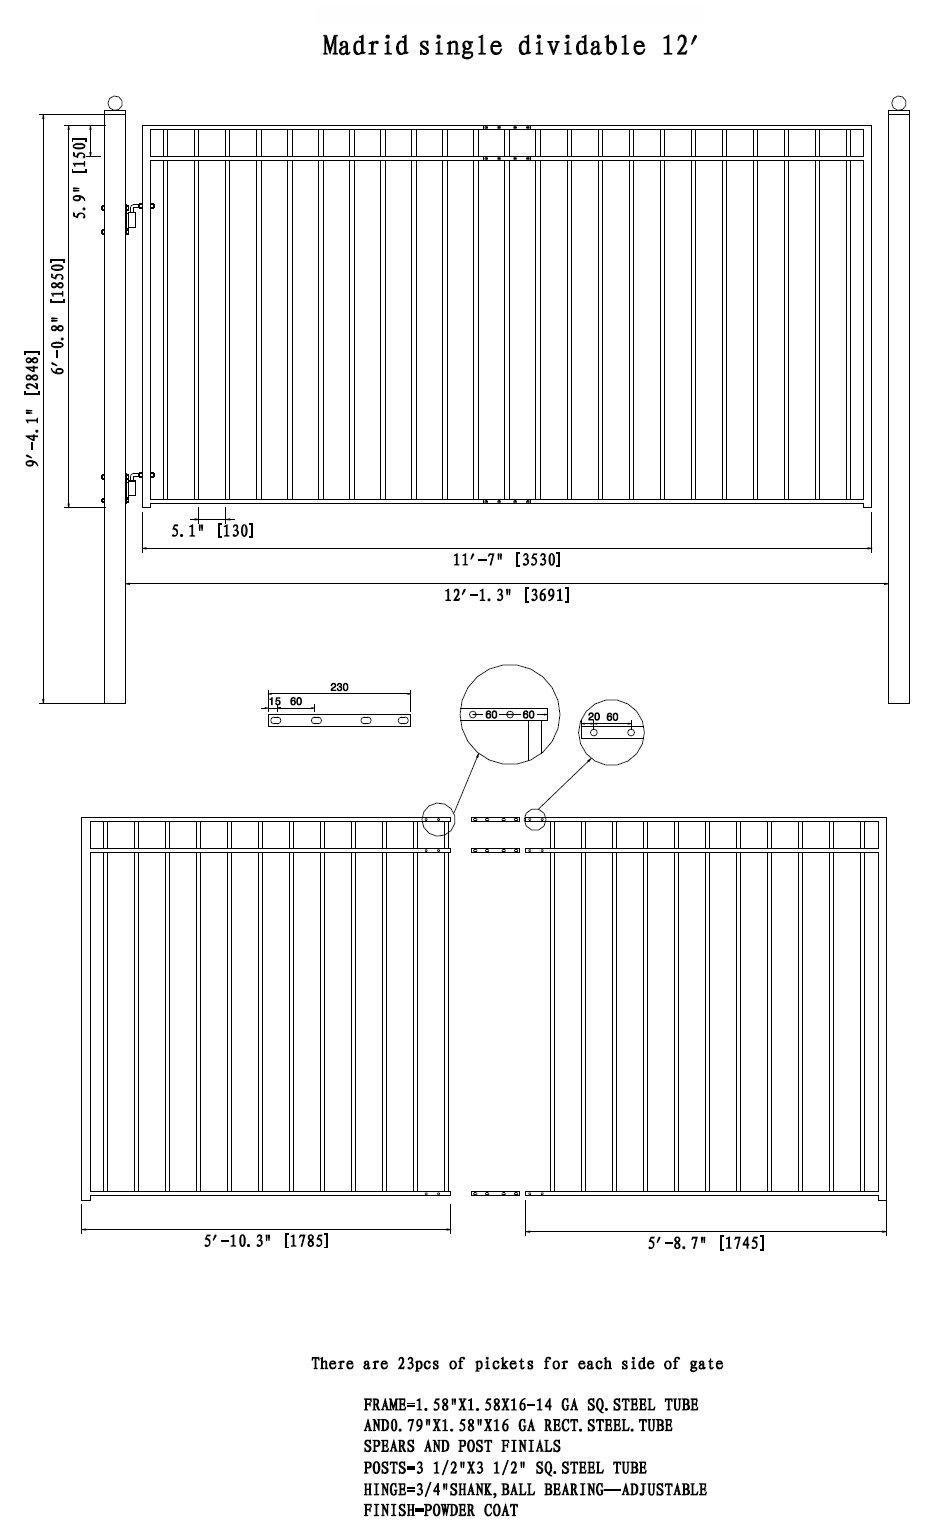 ALEKO Madrid Style Iron Wrought Gate 12' Ornamental Single Swing or Slide Driveway Gates 12'